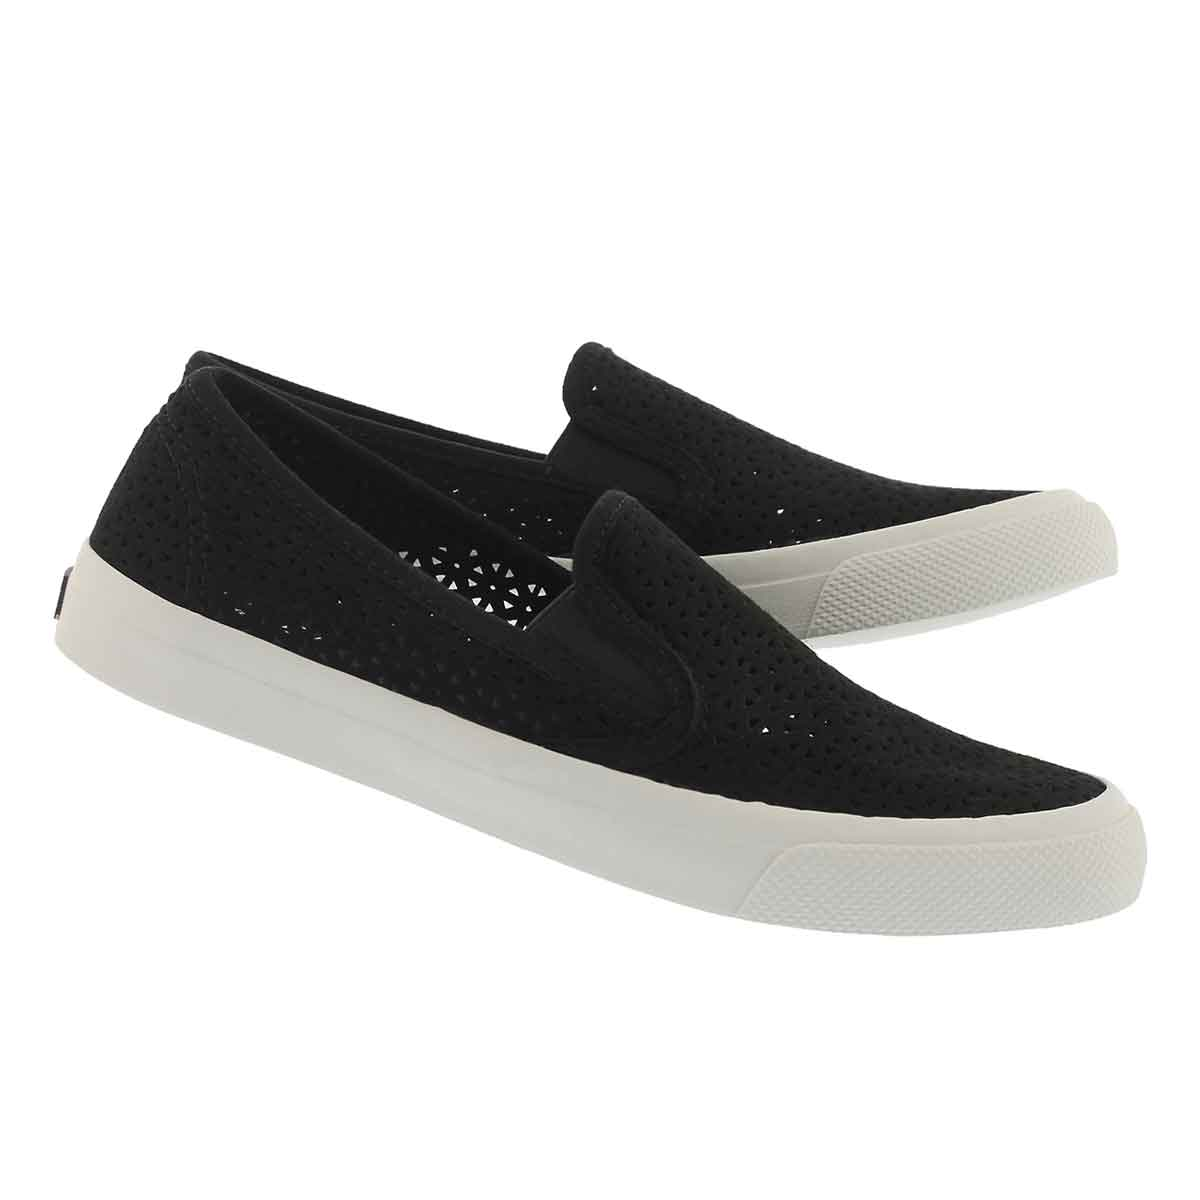 Lds Seaside Nautical Perf black slip on